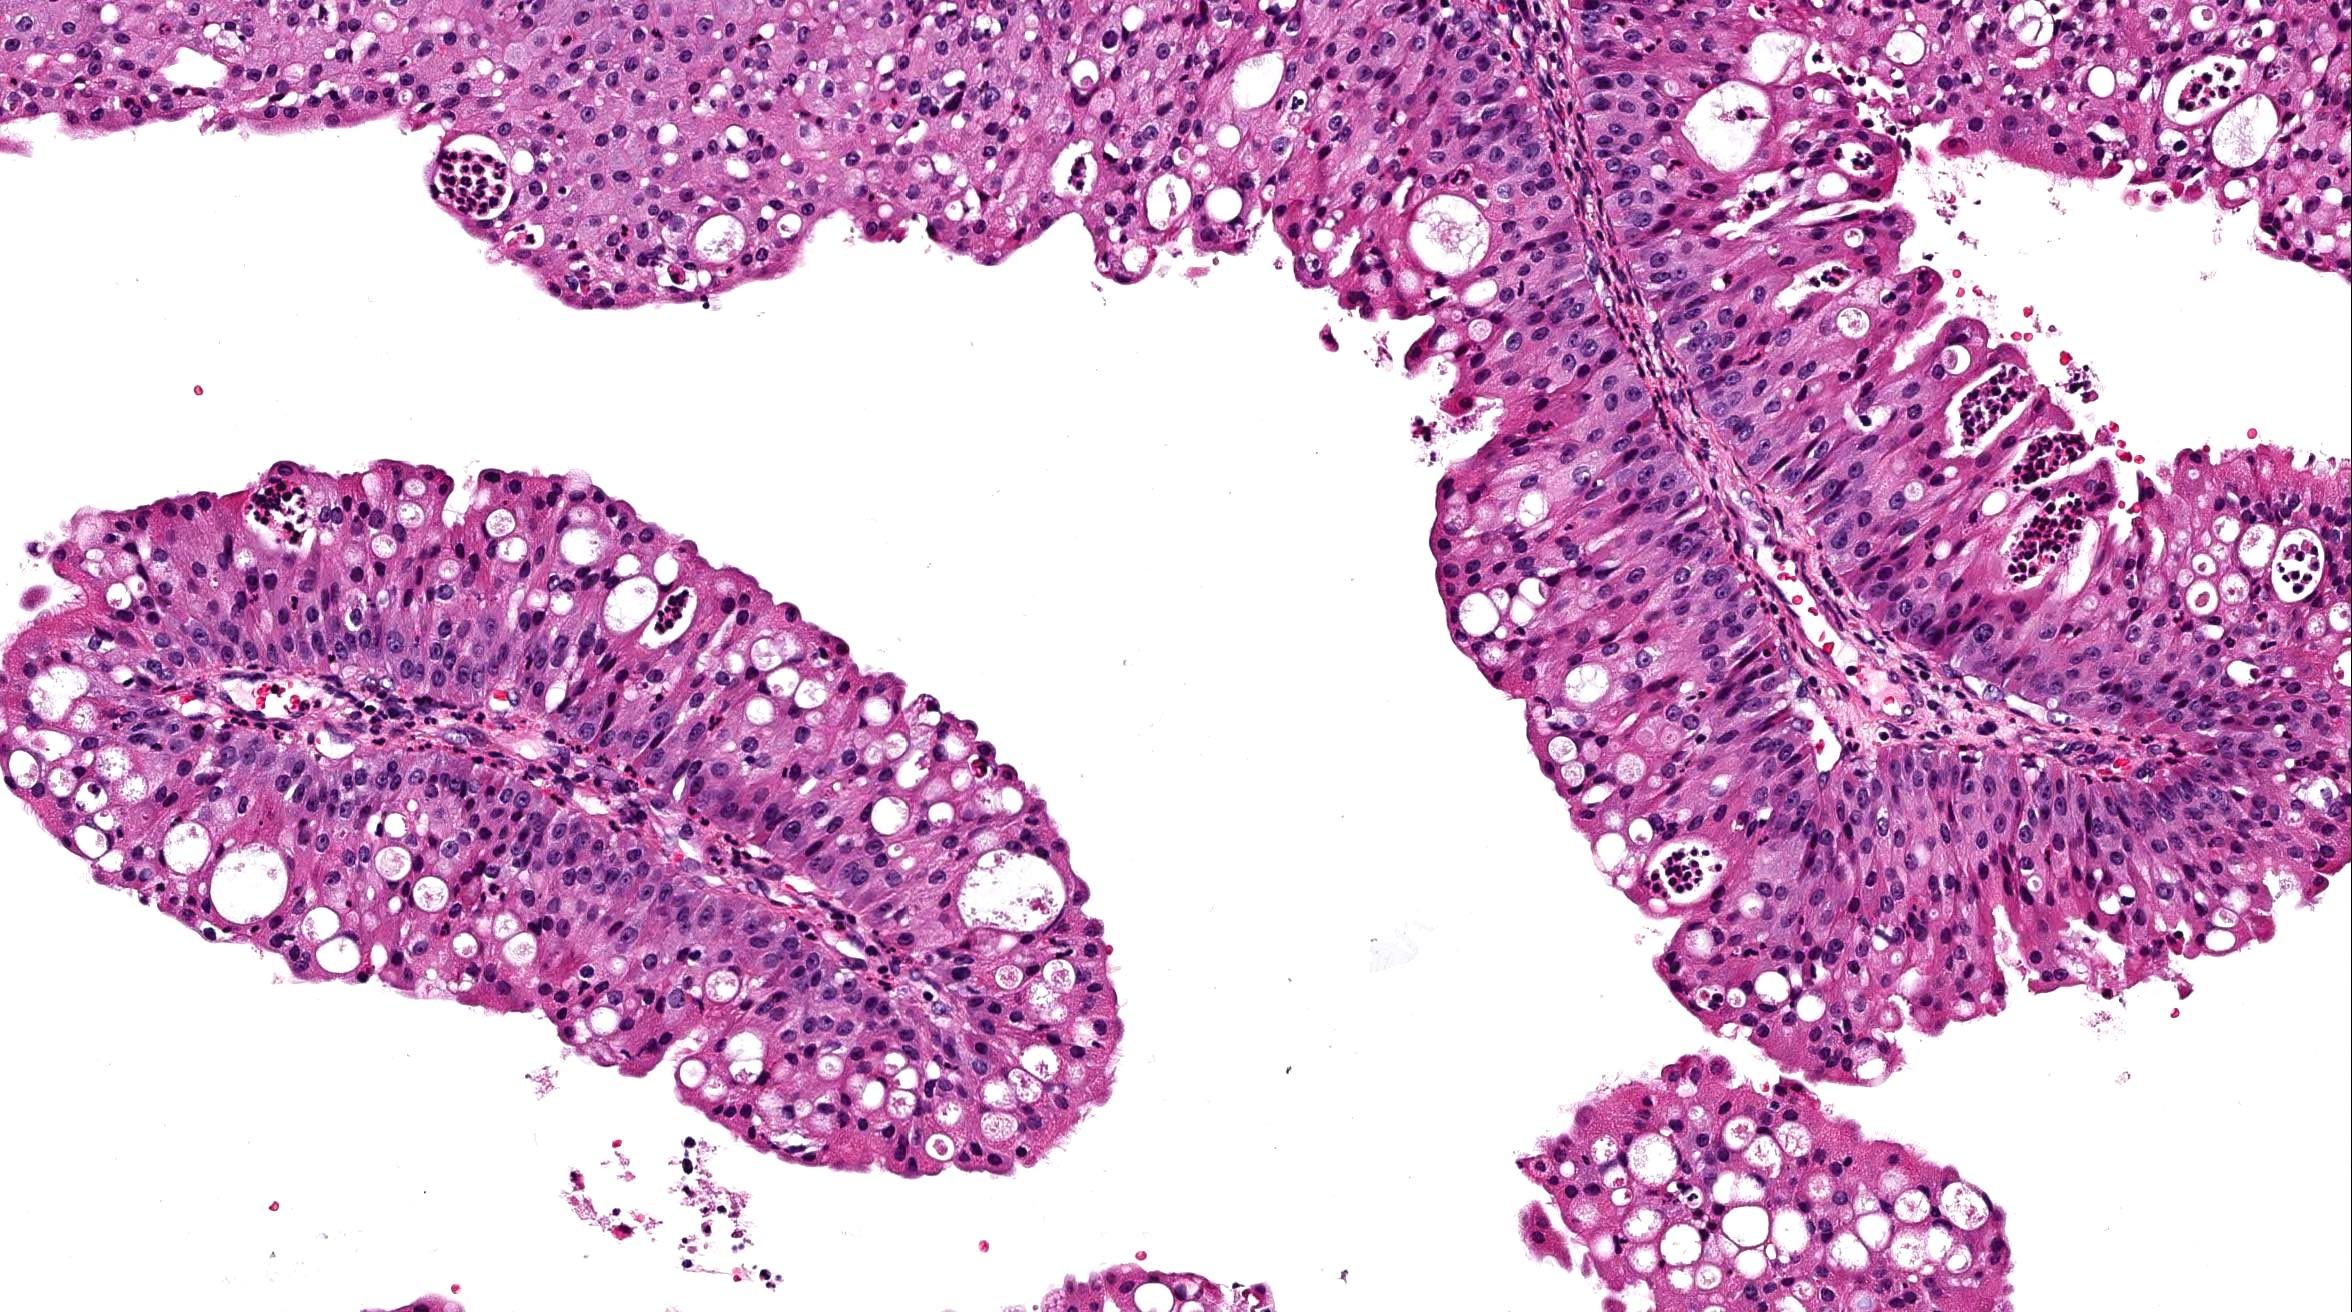 nasal transitional cell papilloma hpv virus bij vrouwen